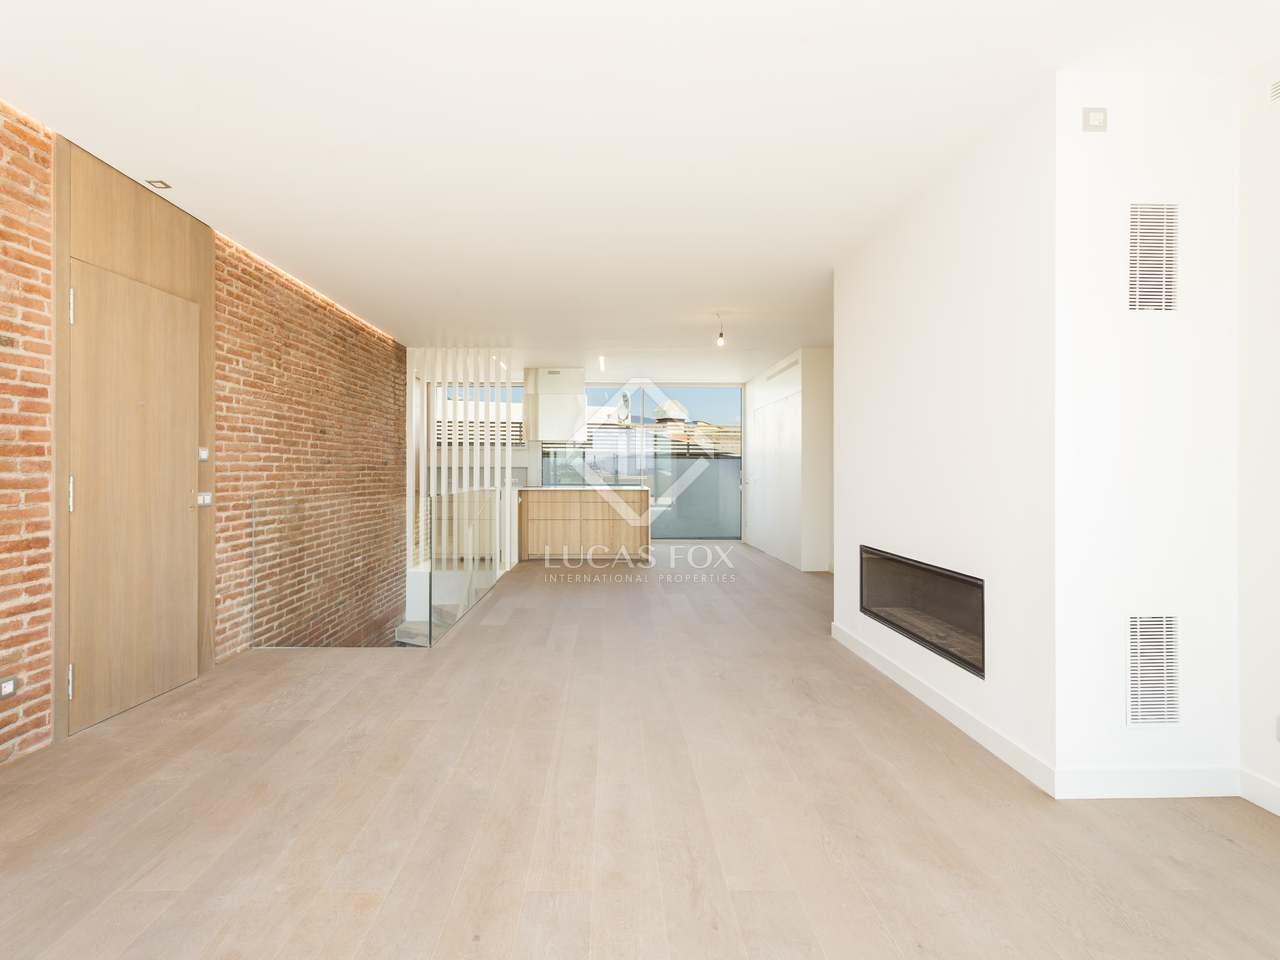 3 bedroom duplex penthouse for sale on avinguda diagonal for Three bedroom duplex